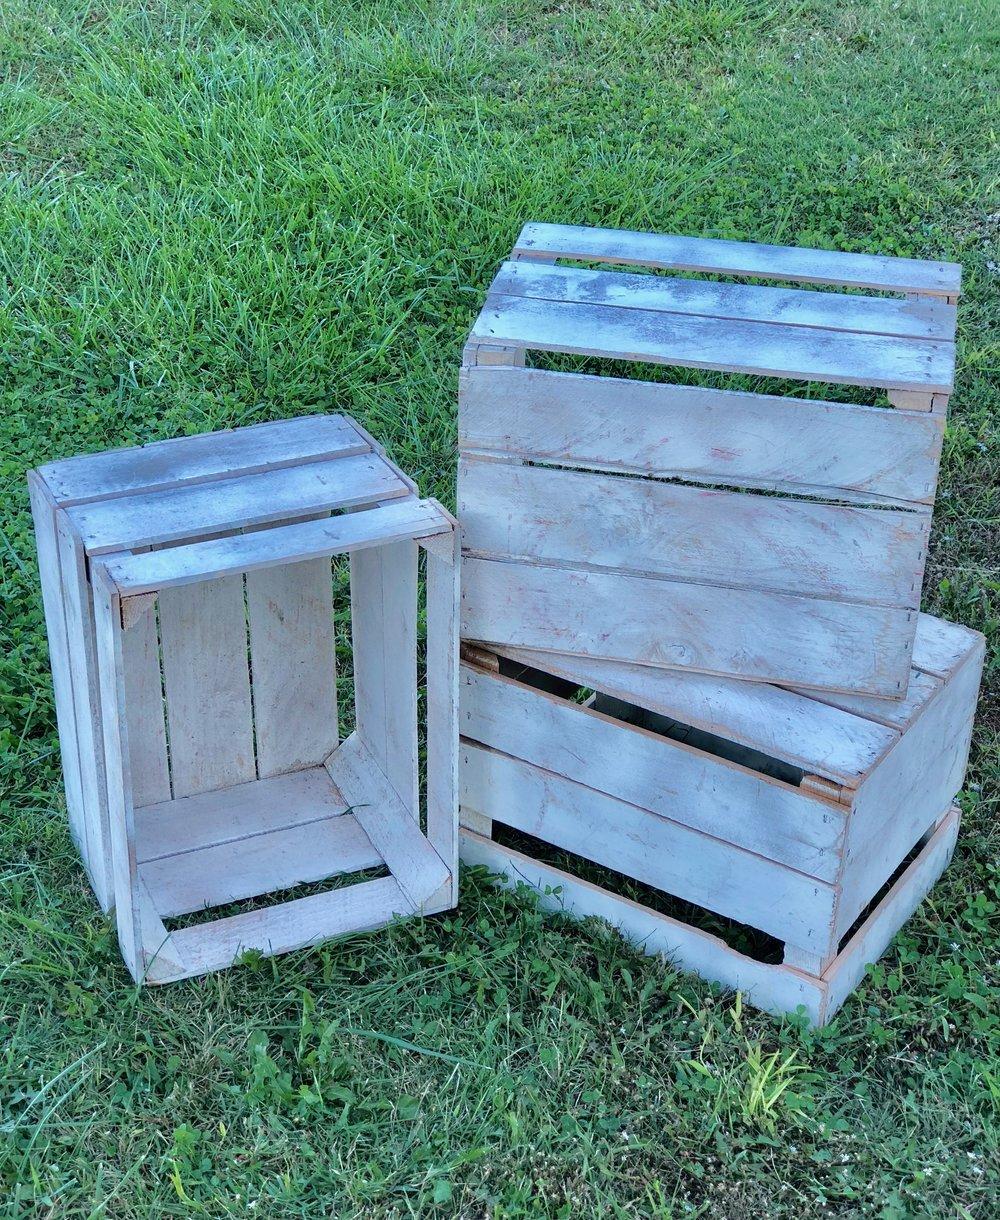 White Crates